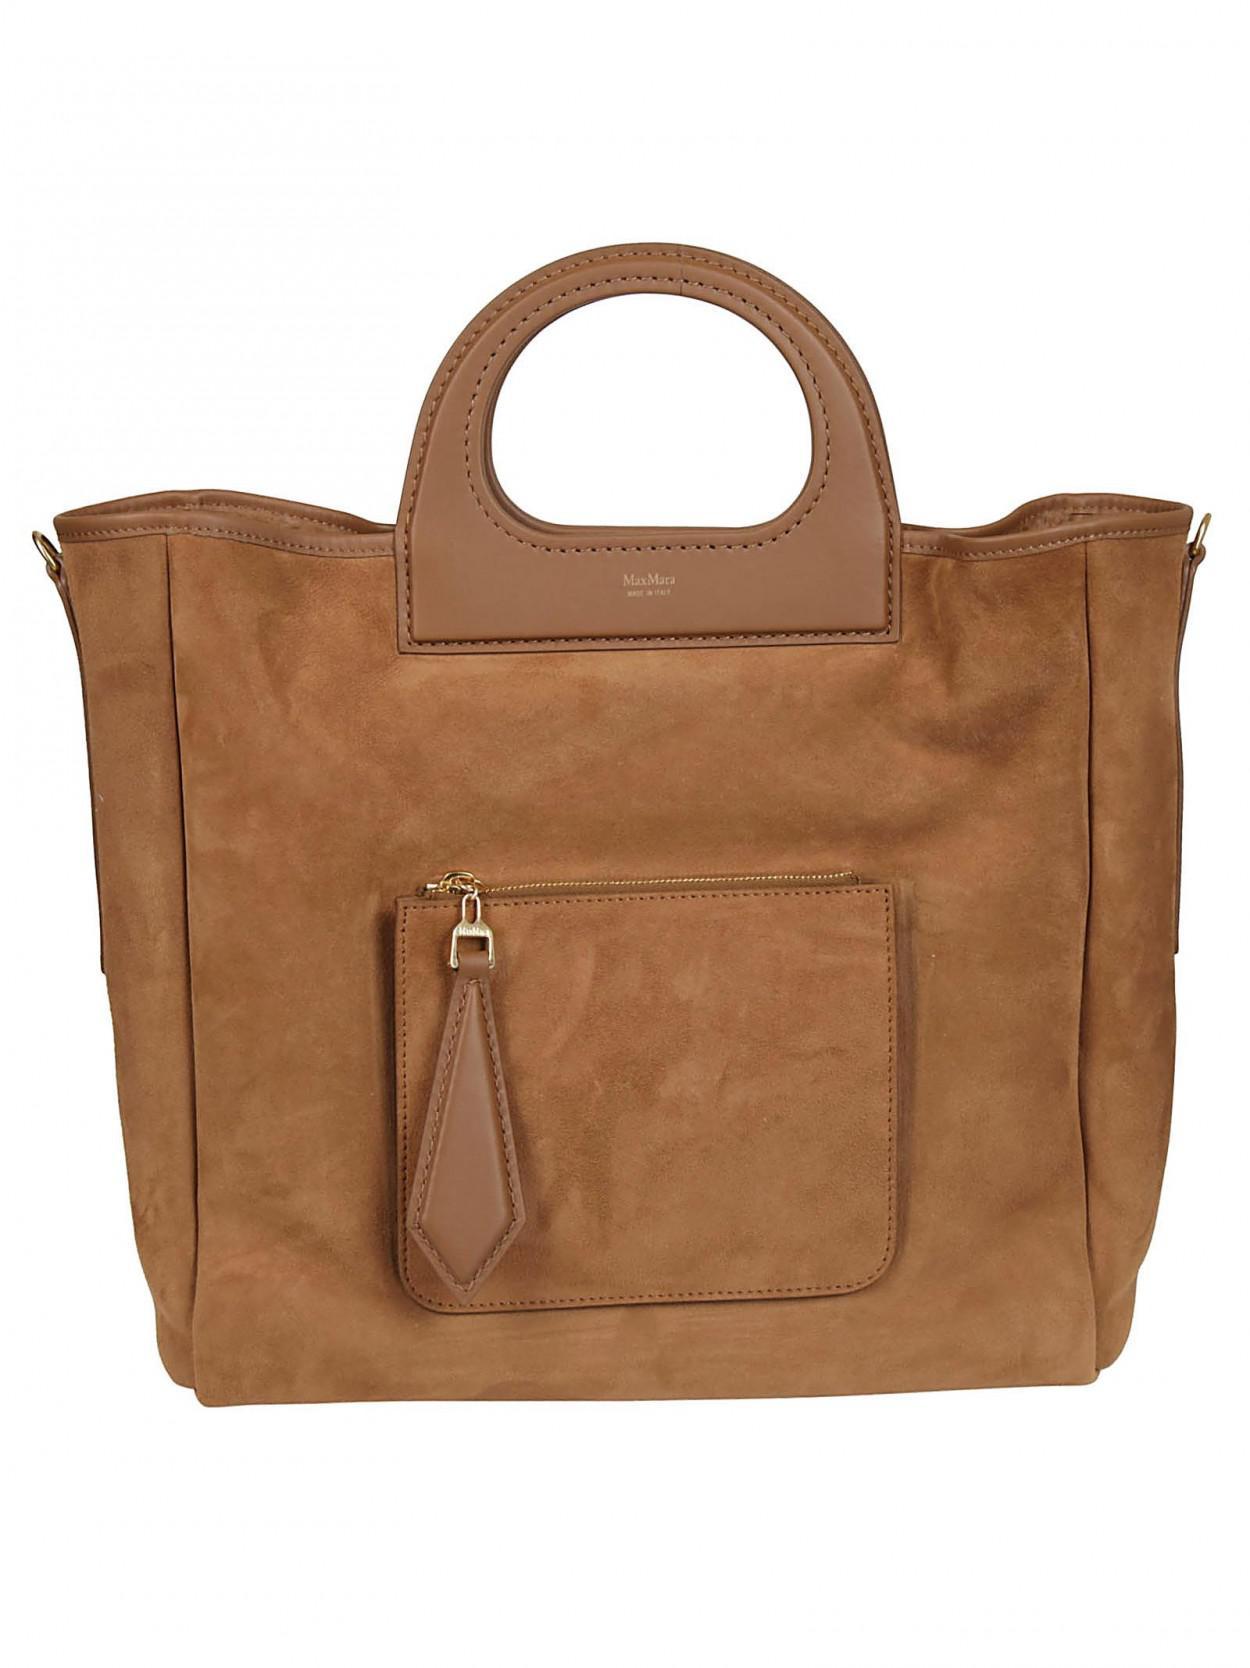 50ef1a6eb Max Mara Top Handle Tote Bag in Brown - Save 49% - Lyst